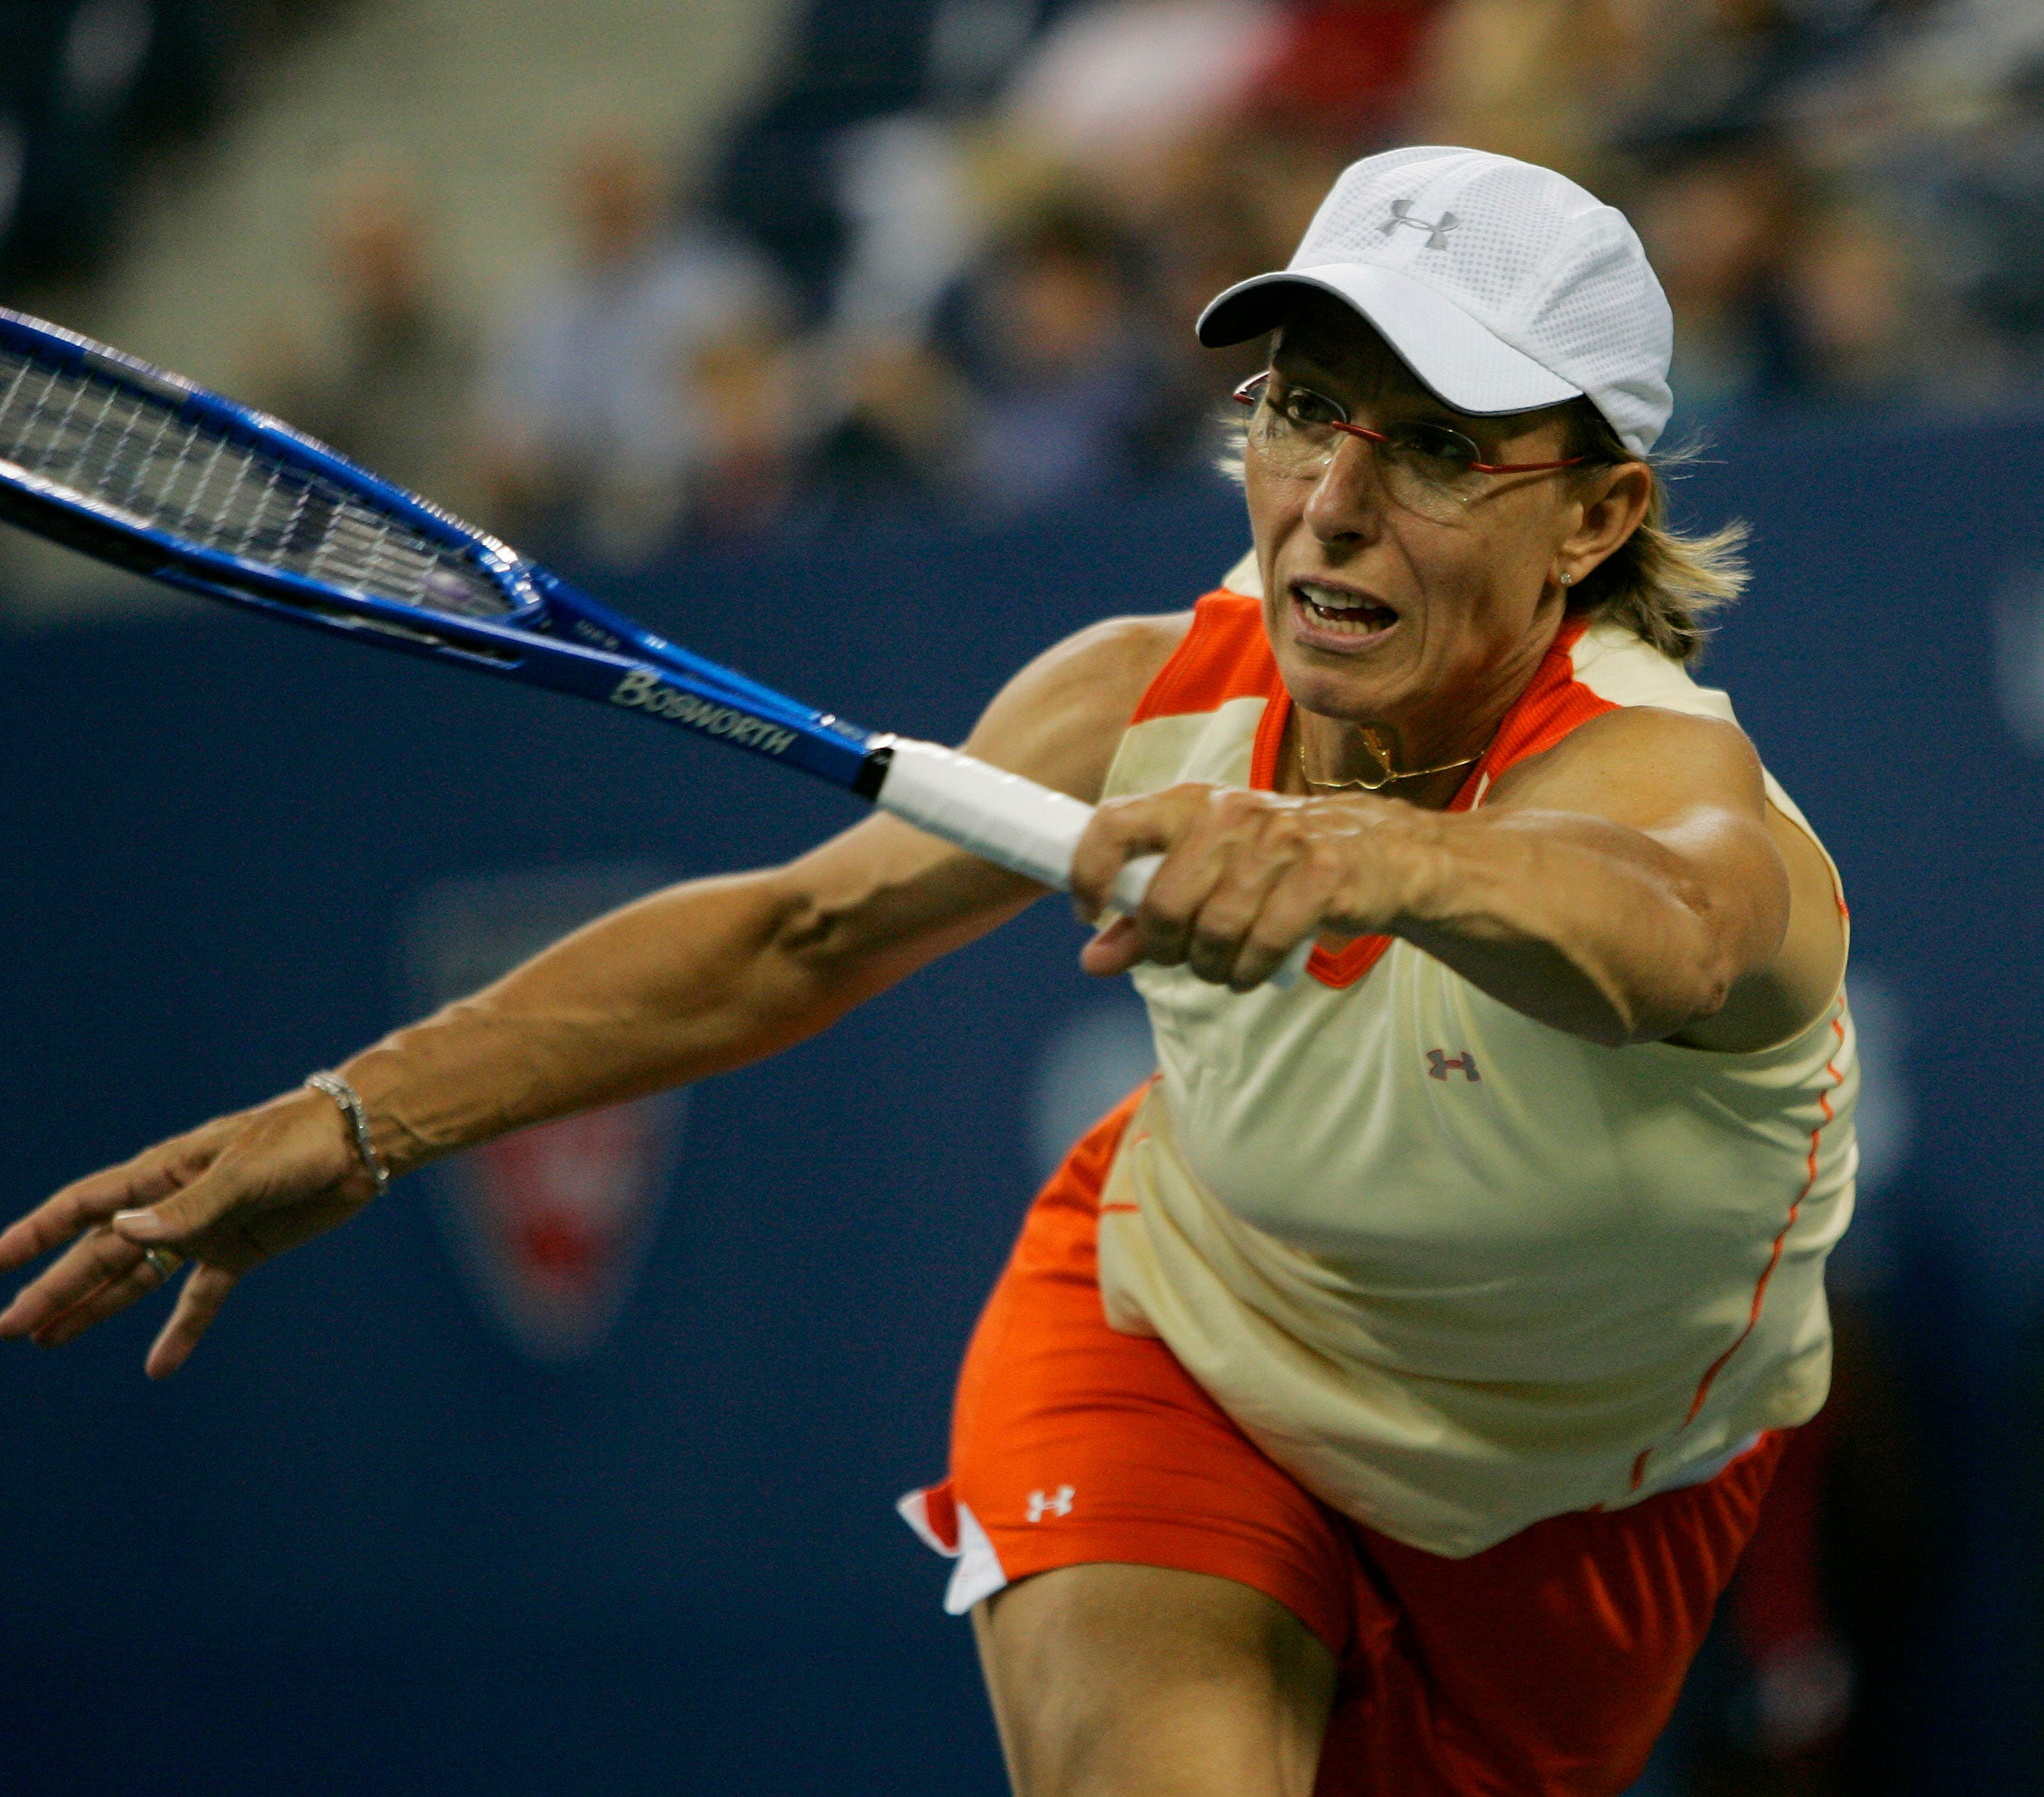 Martina Navratilova 18 Grand Slam singles titles Martina Navratilova 18 Grand Slam singles titles new pictures